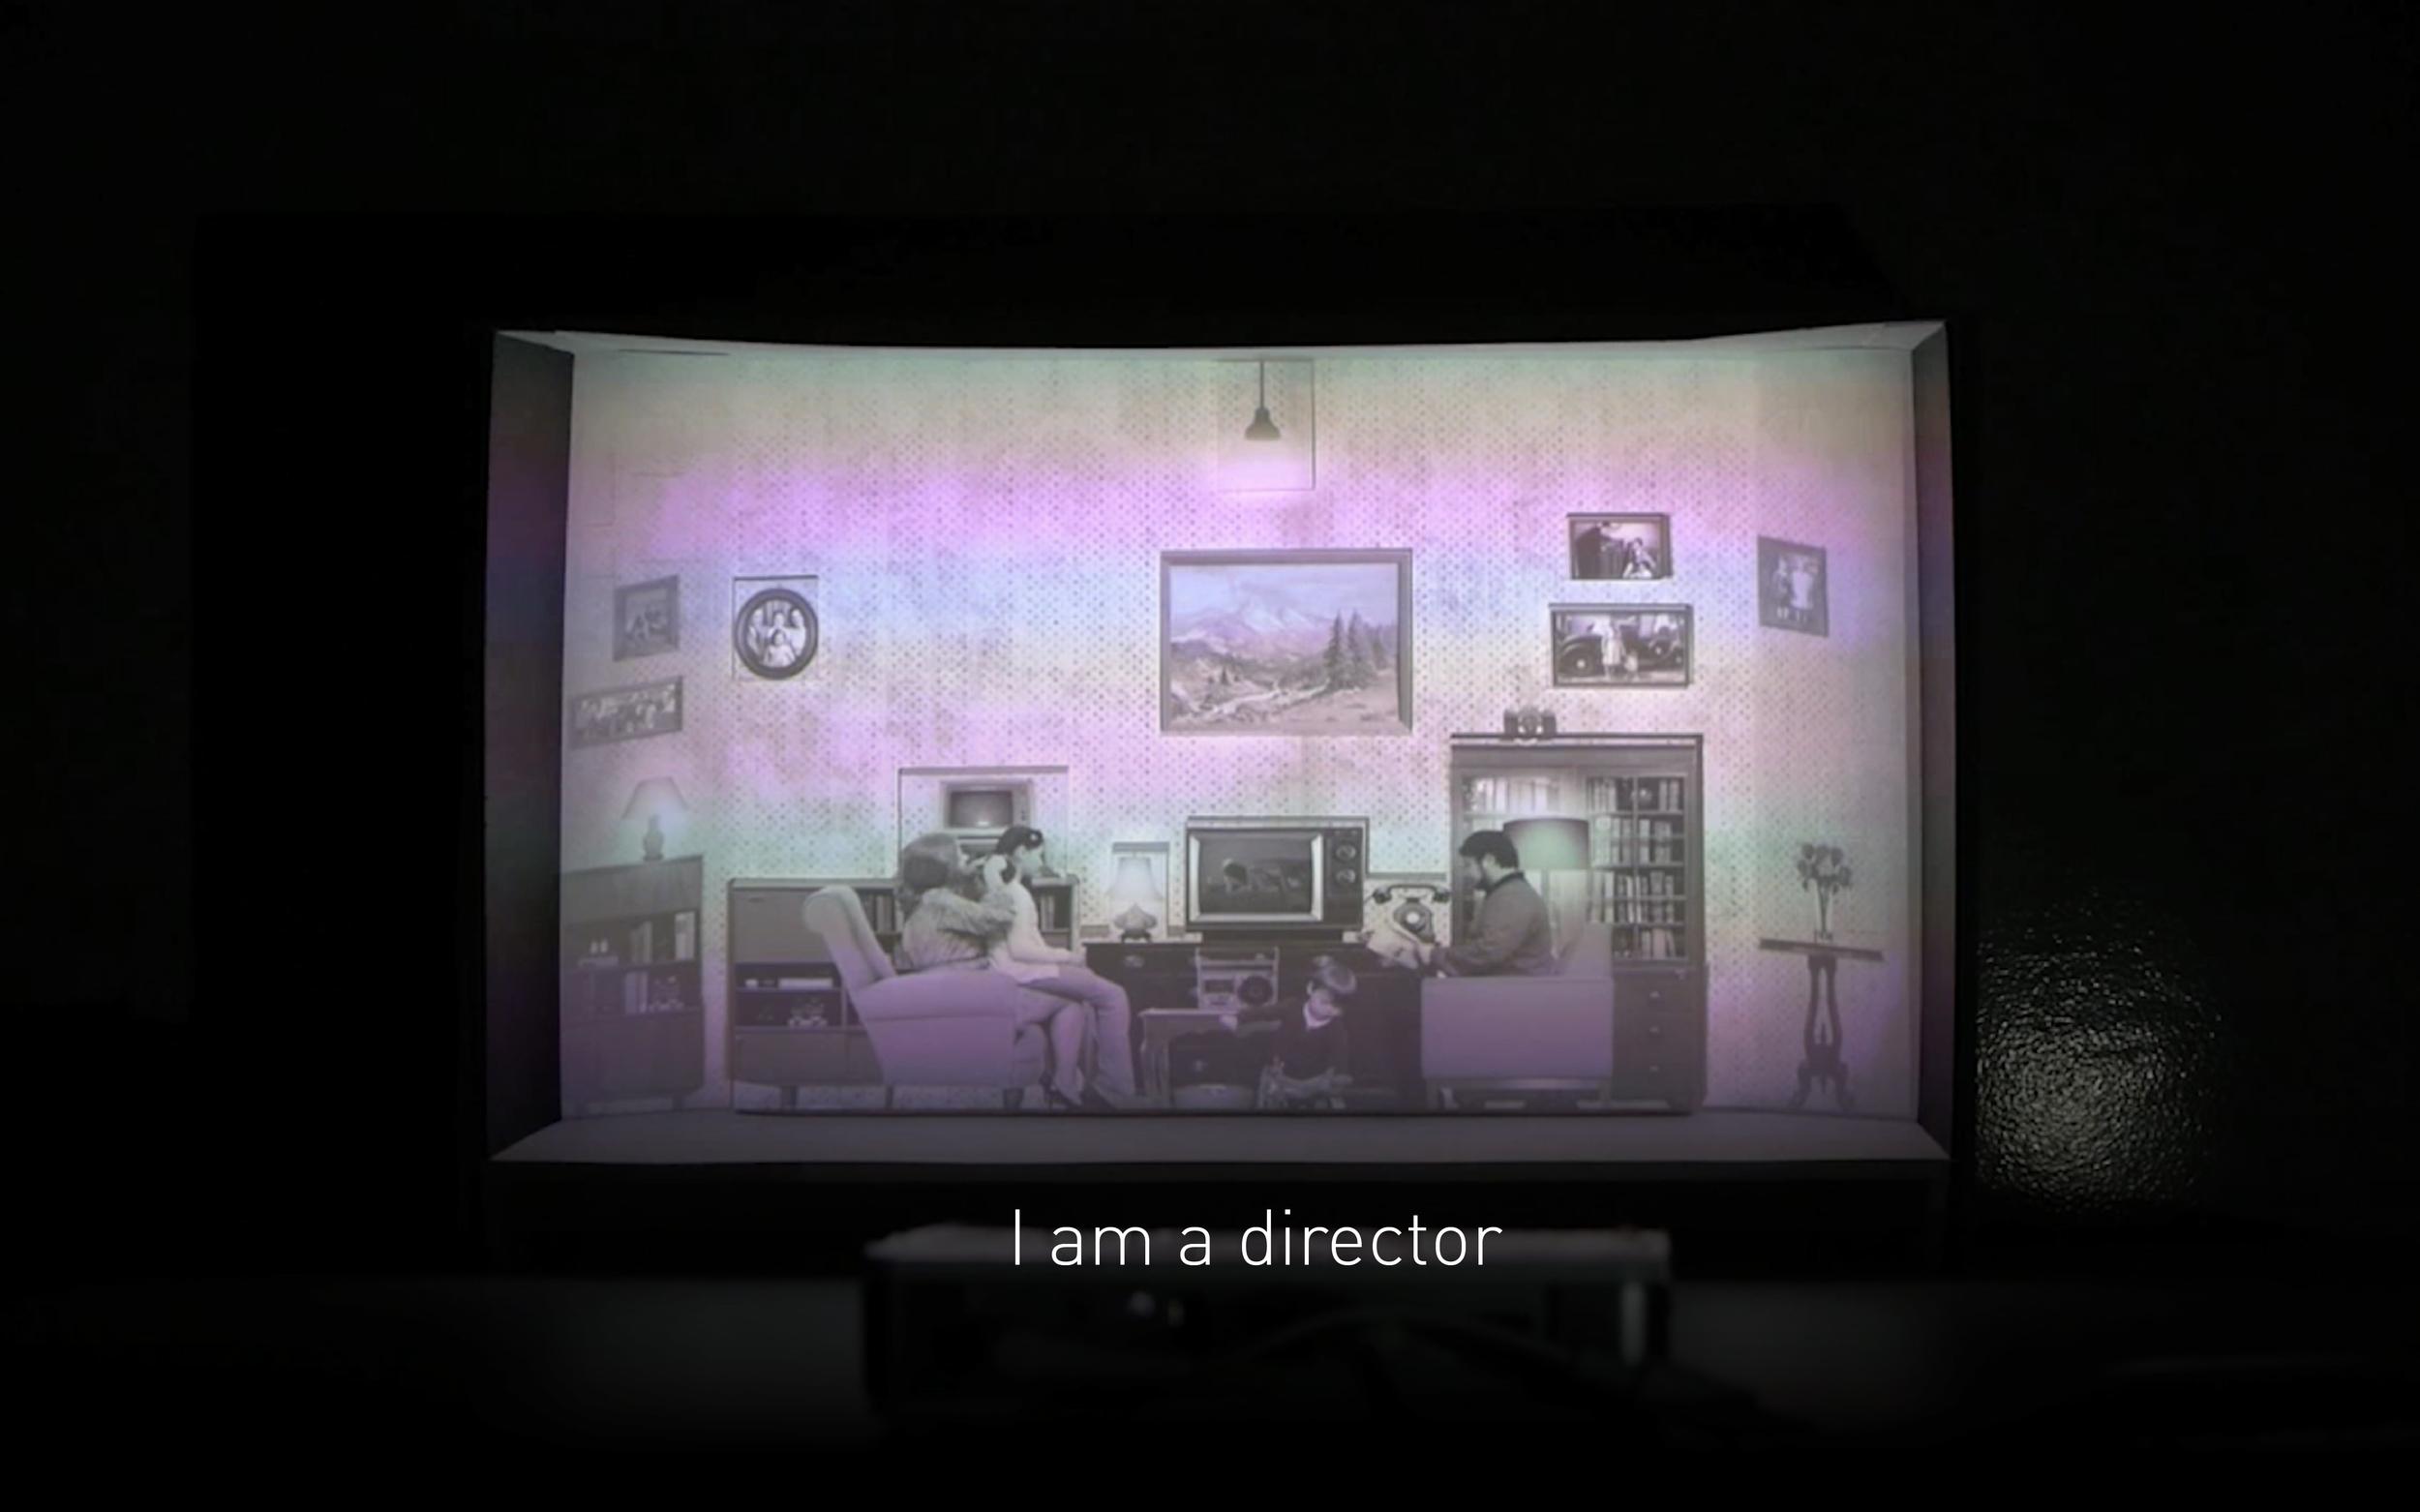 director-01.jpg